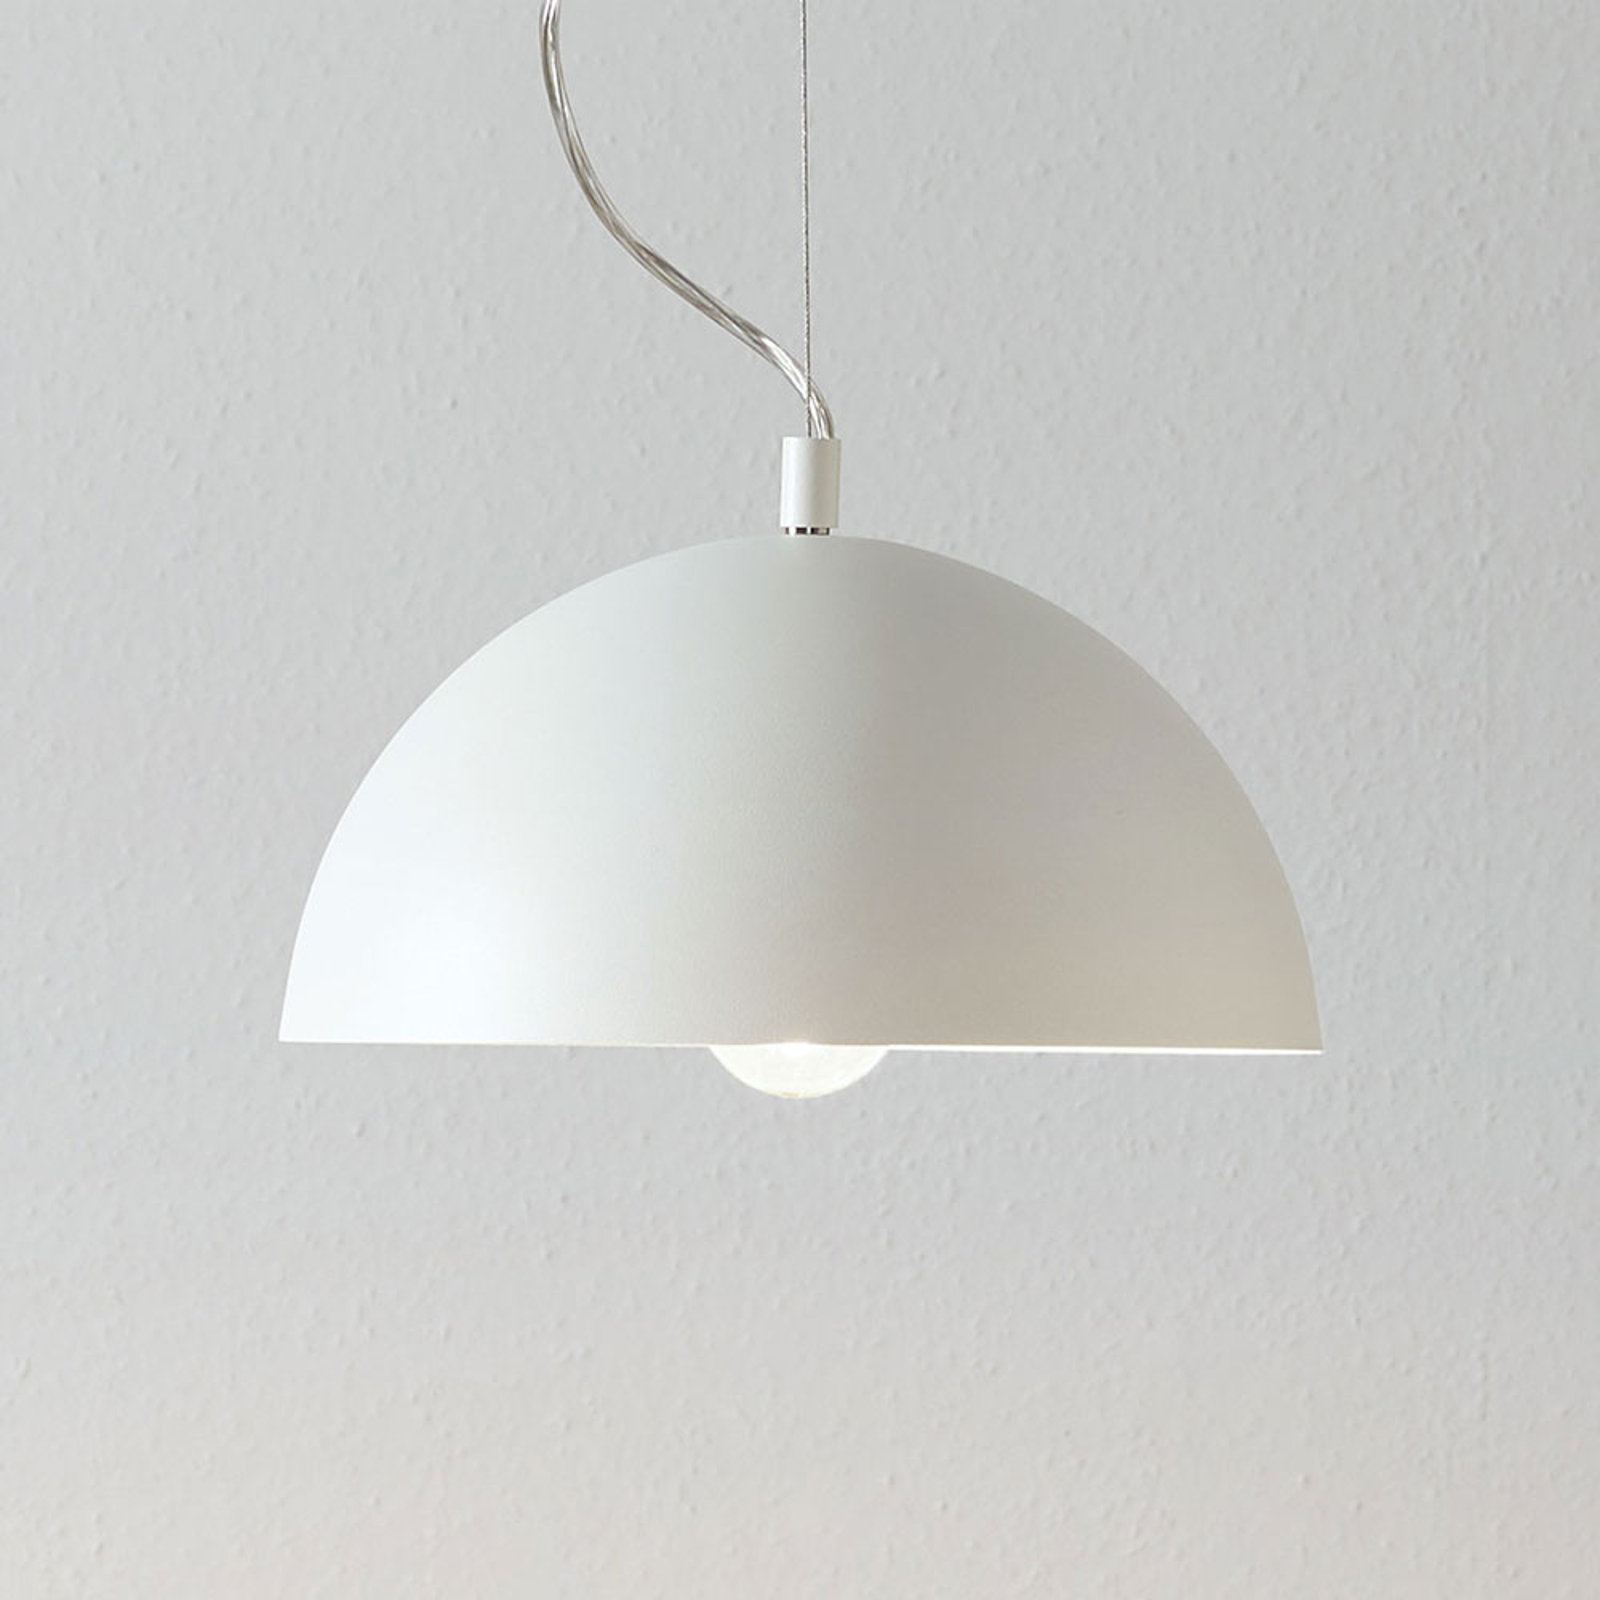 Lucande Maleo lampa wisząca 30cm biała